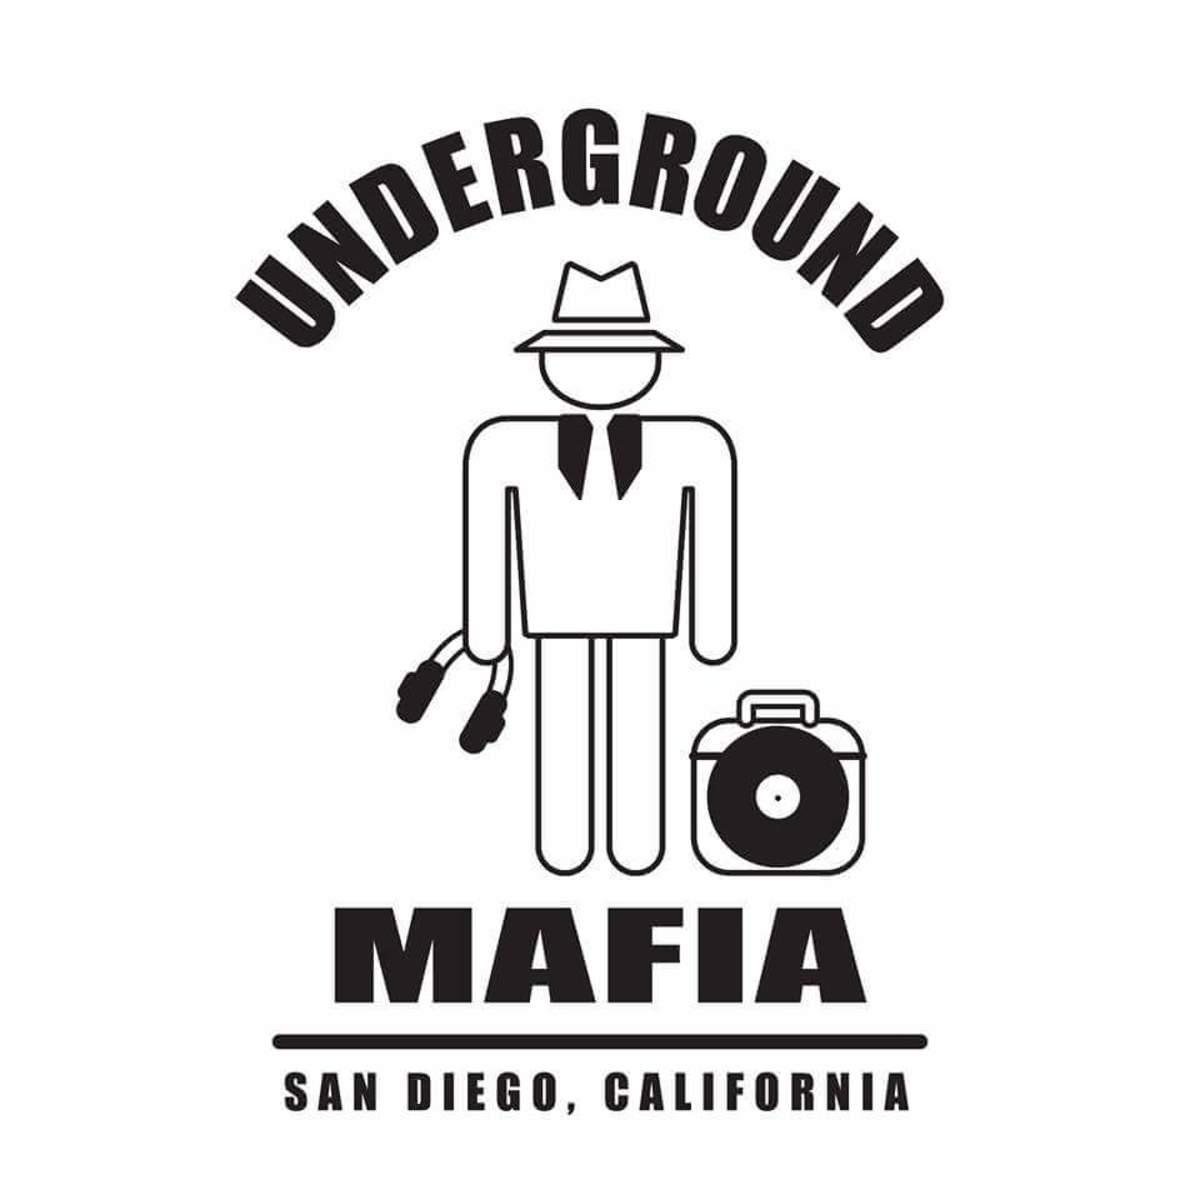 underground mafia logo.jpg